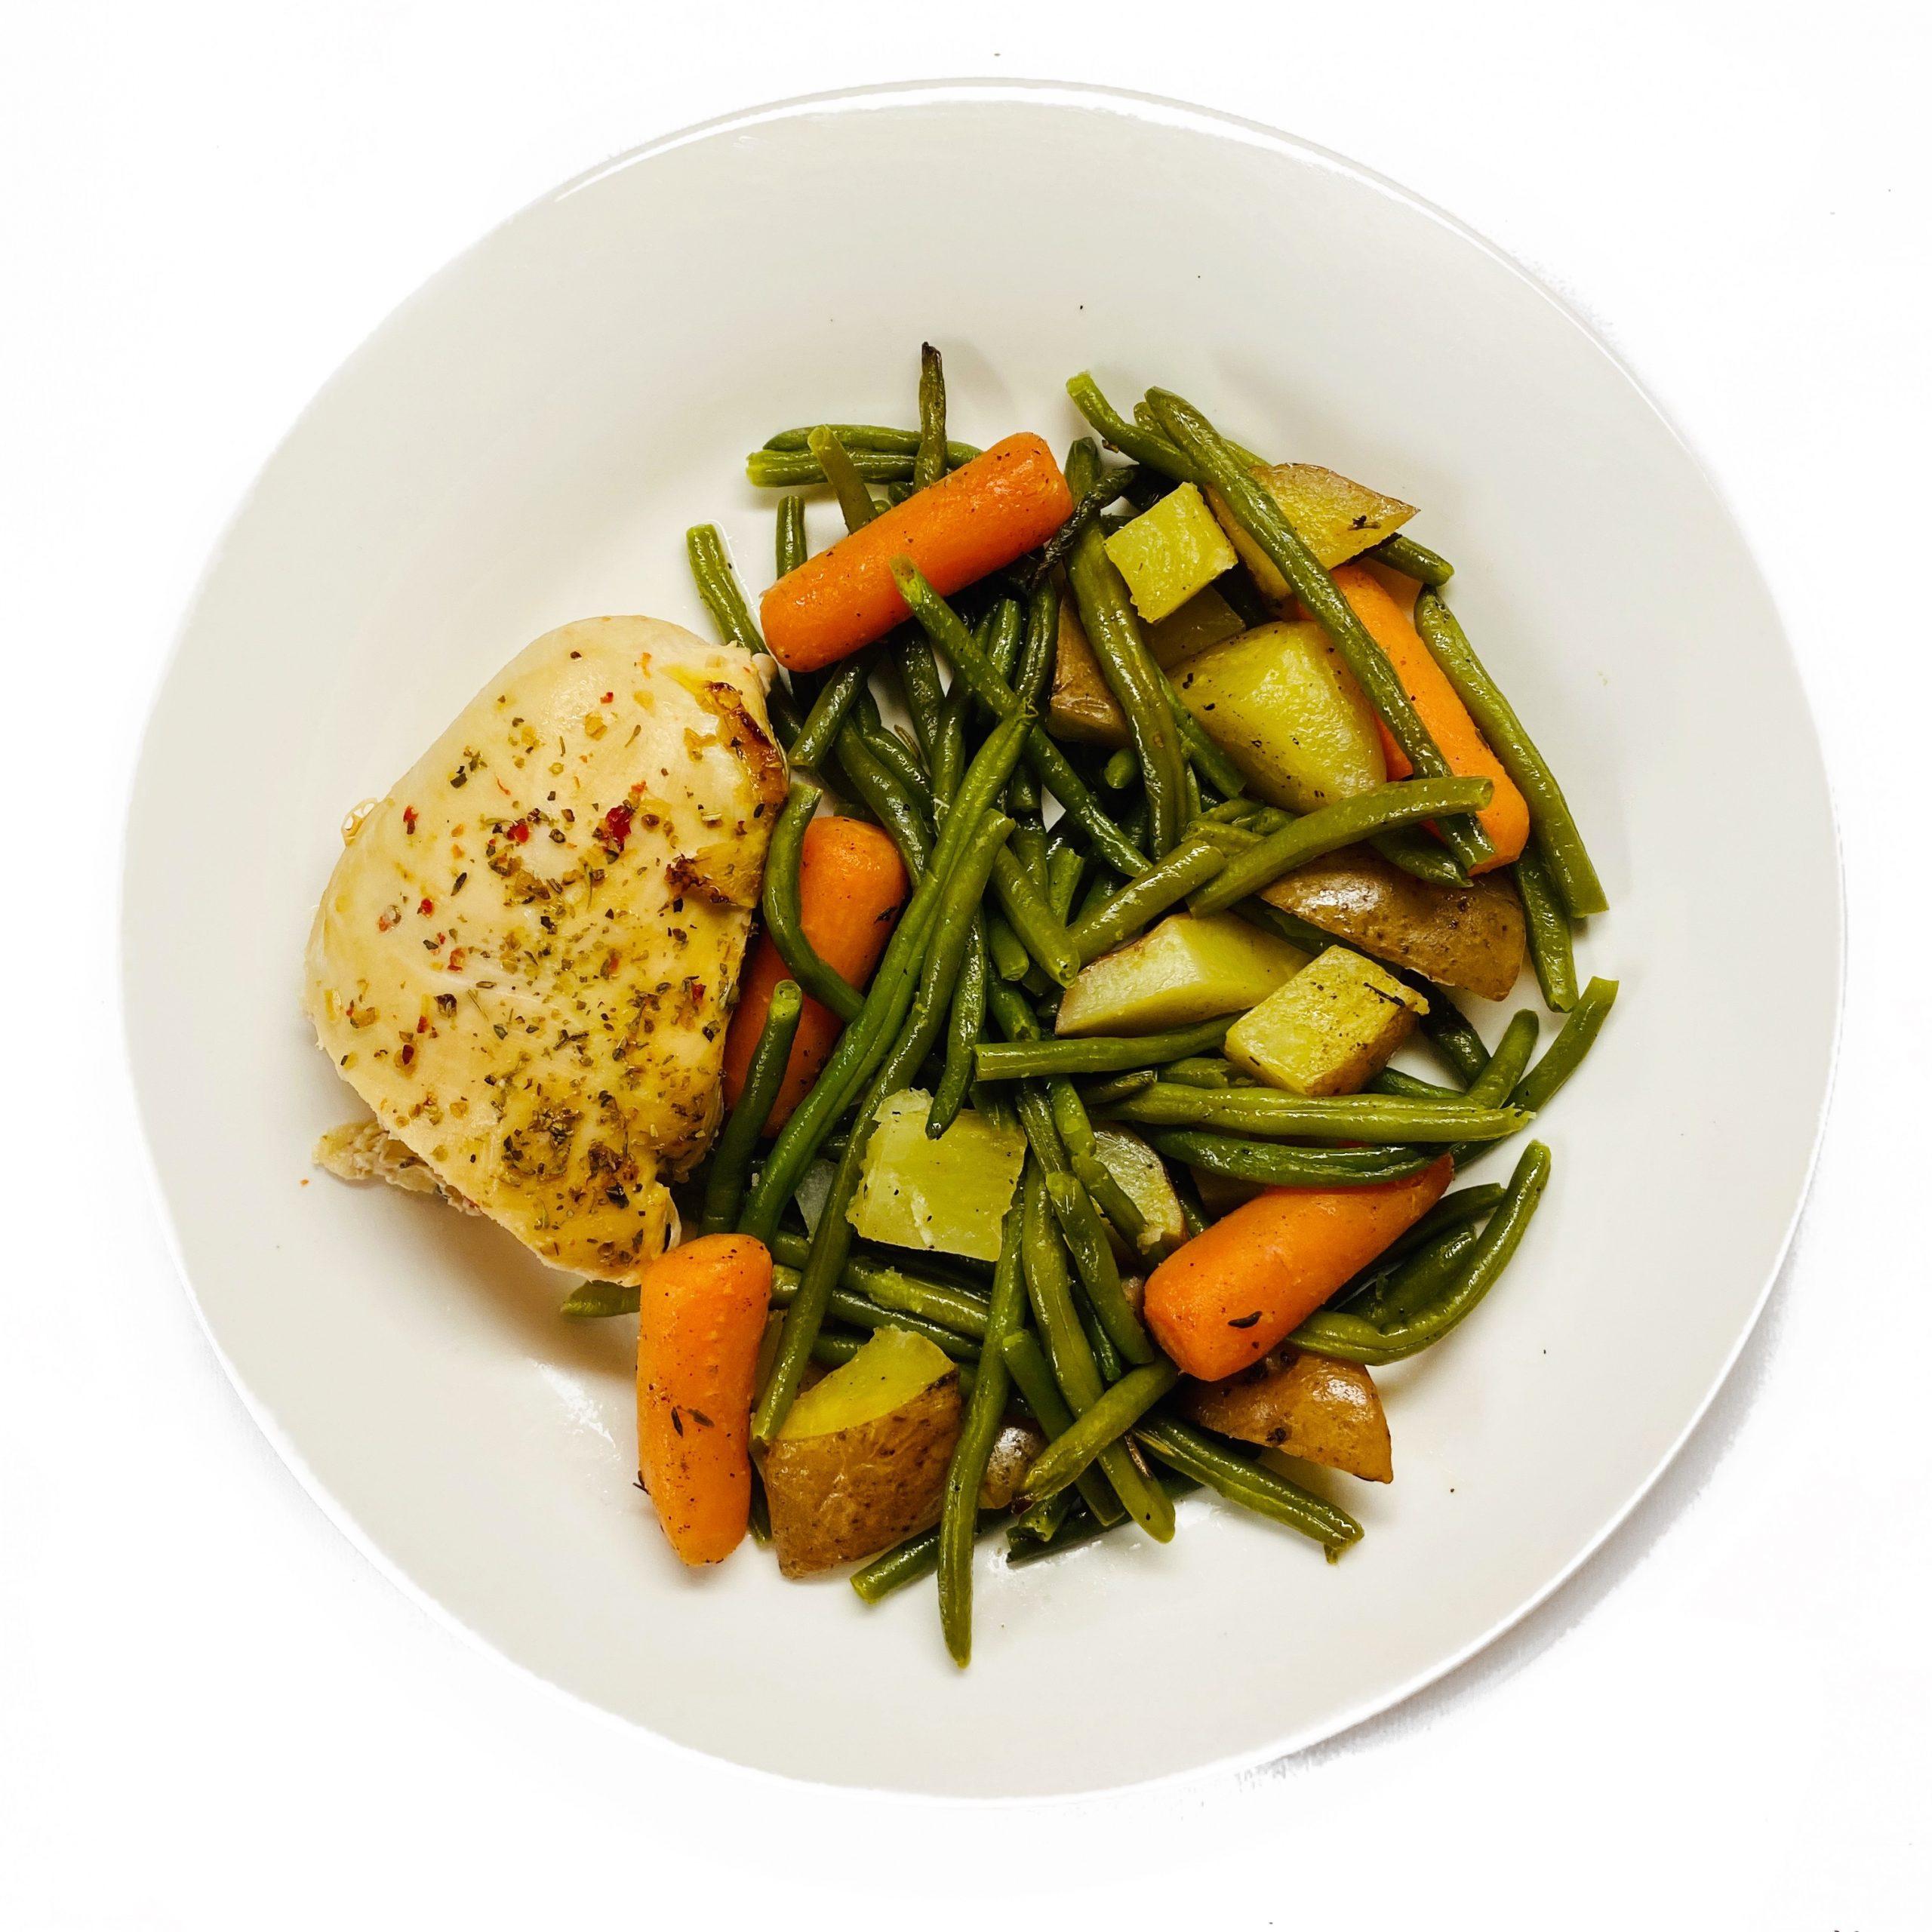 Italian Chicken and Herb Roasted Veggies